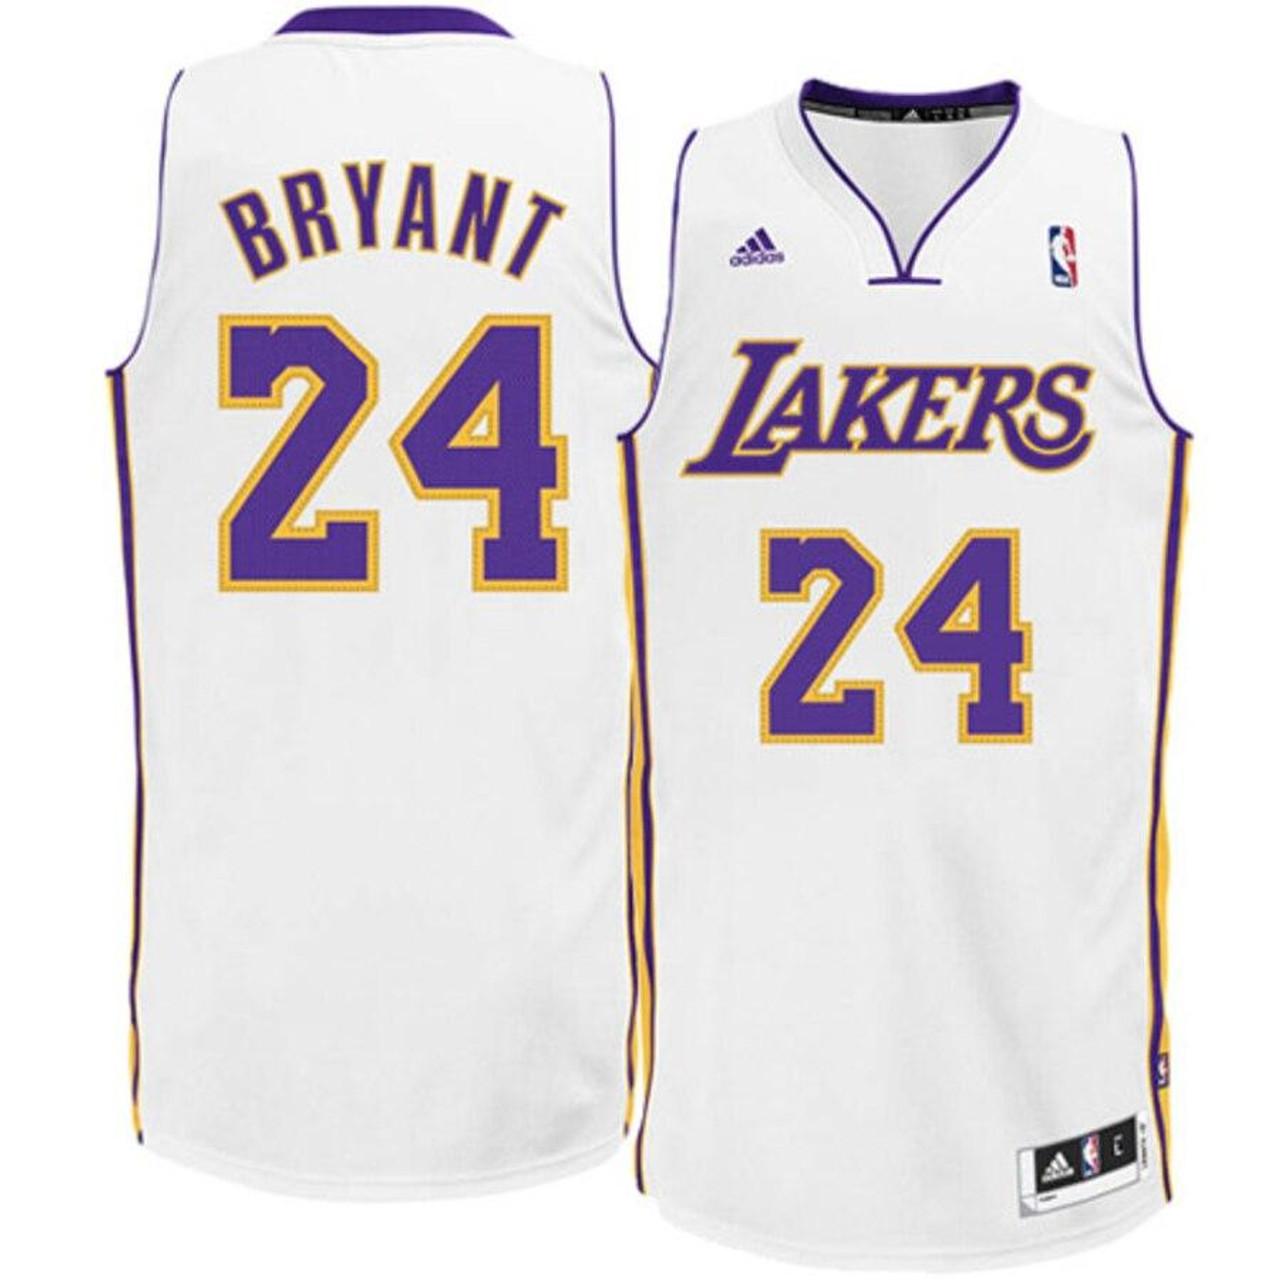 Los Angeles Lakers Kobe Bryant #24 Alternate White Adidas Jersey